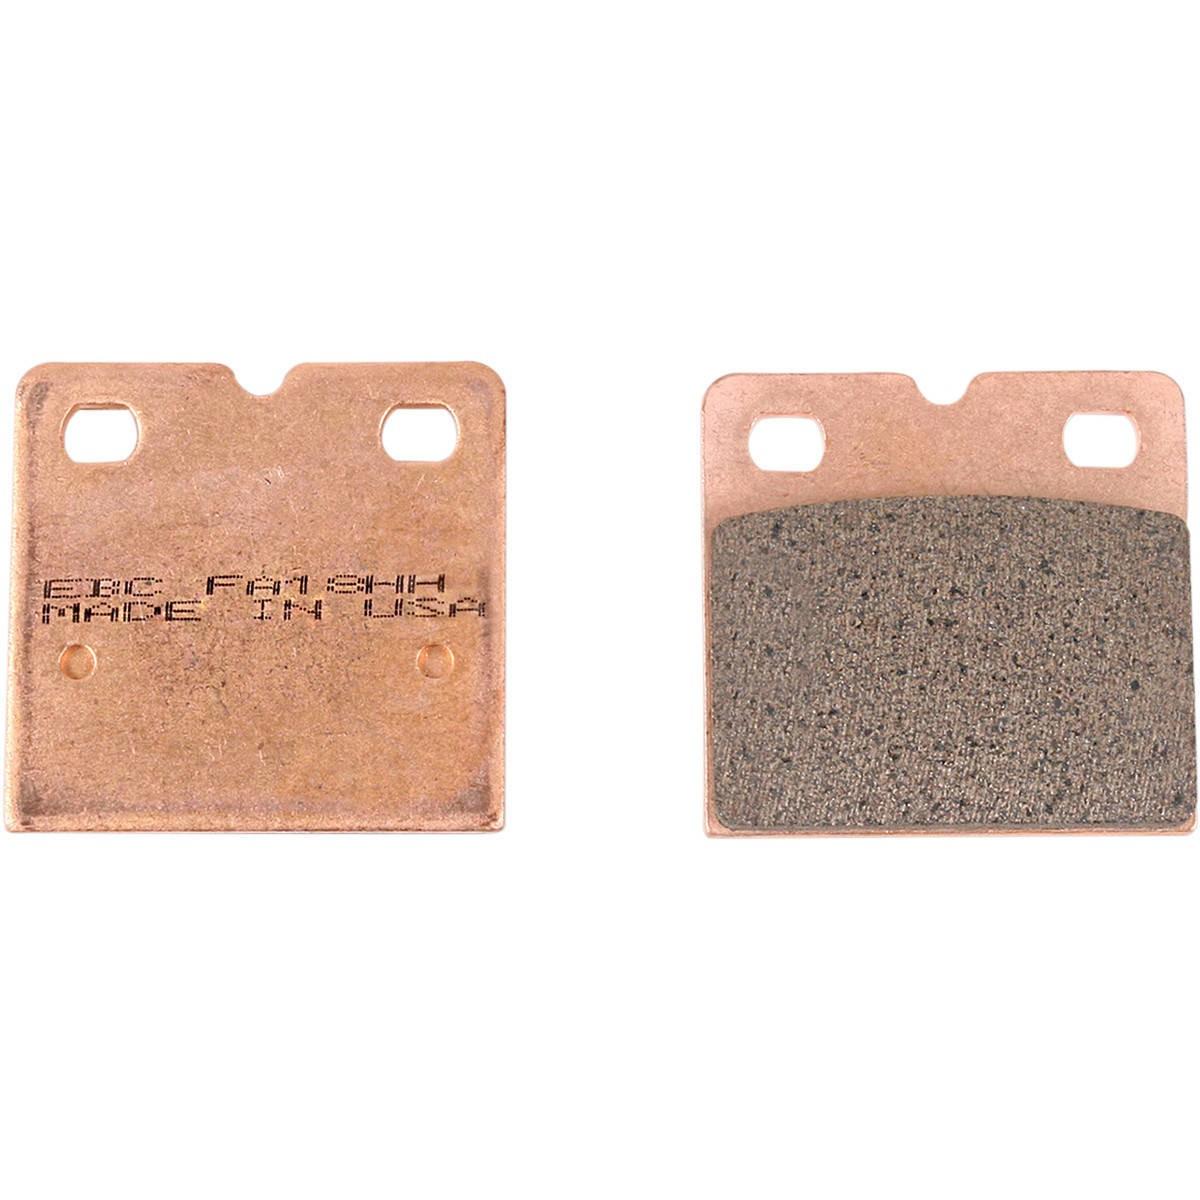 EBC Double-H Sintered Brake Pads - FA018HH